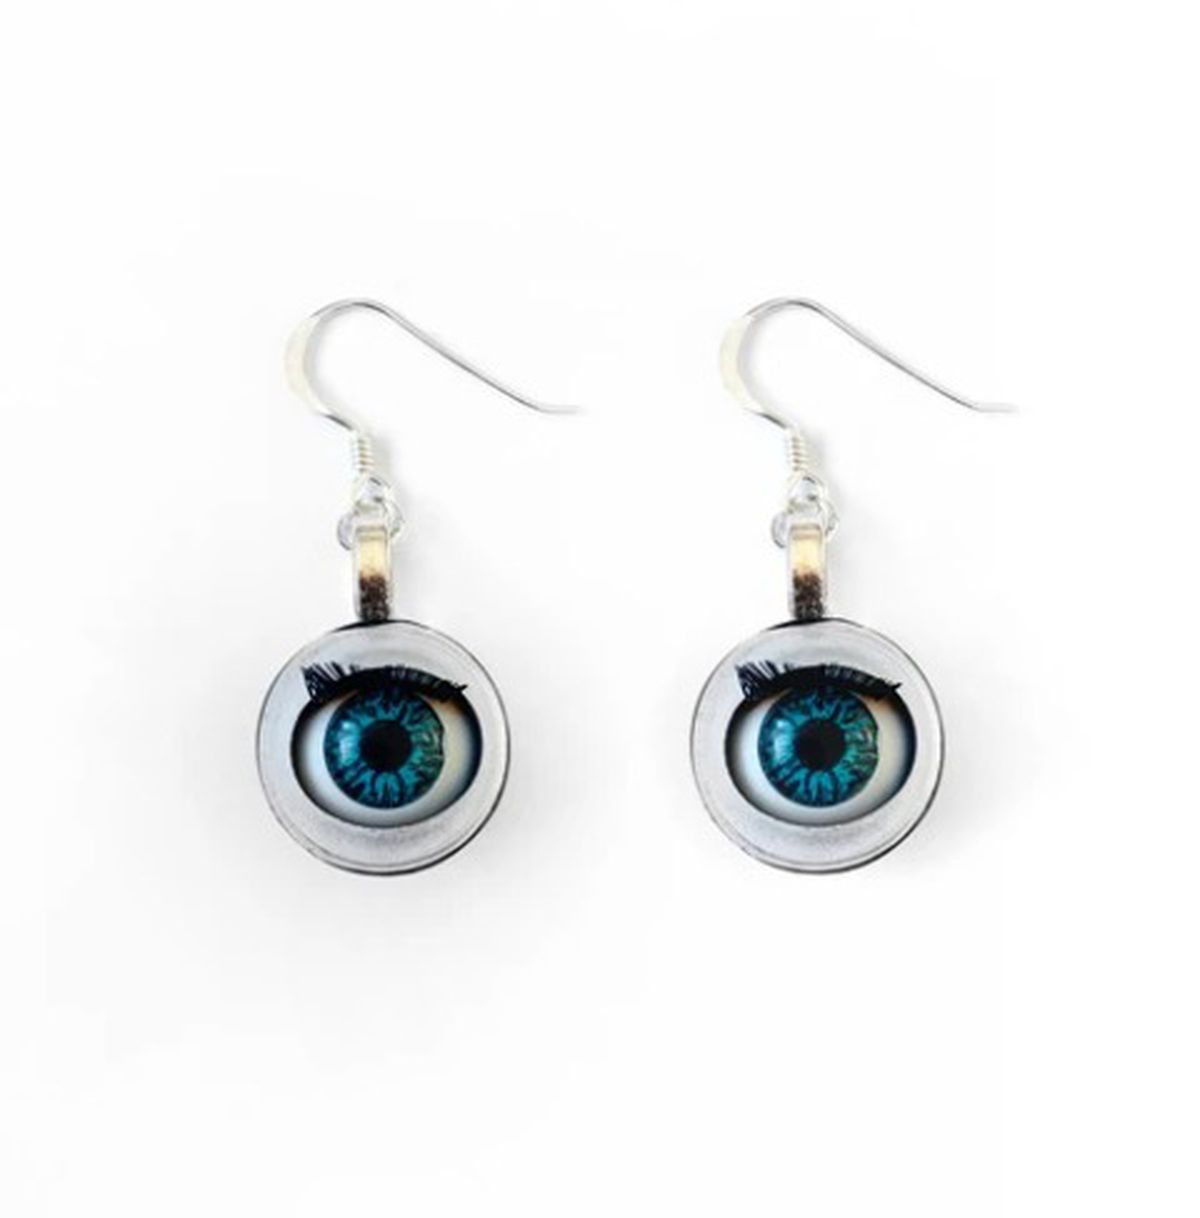 Small Blue Blinking Doll Eye Oddity Earrings